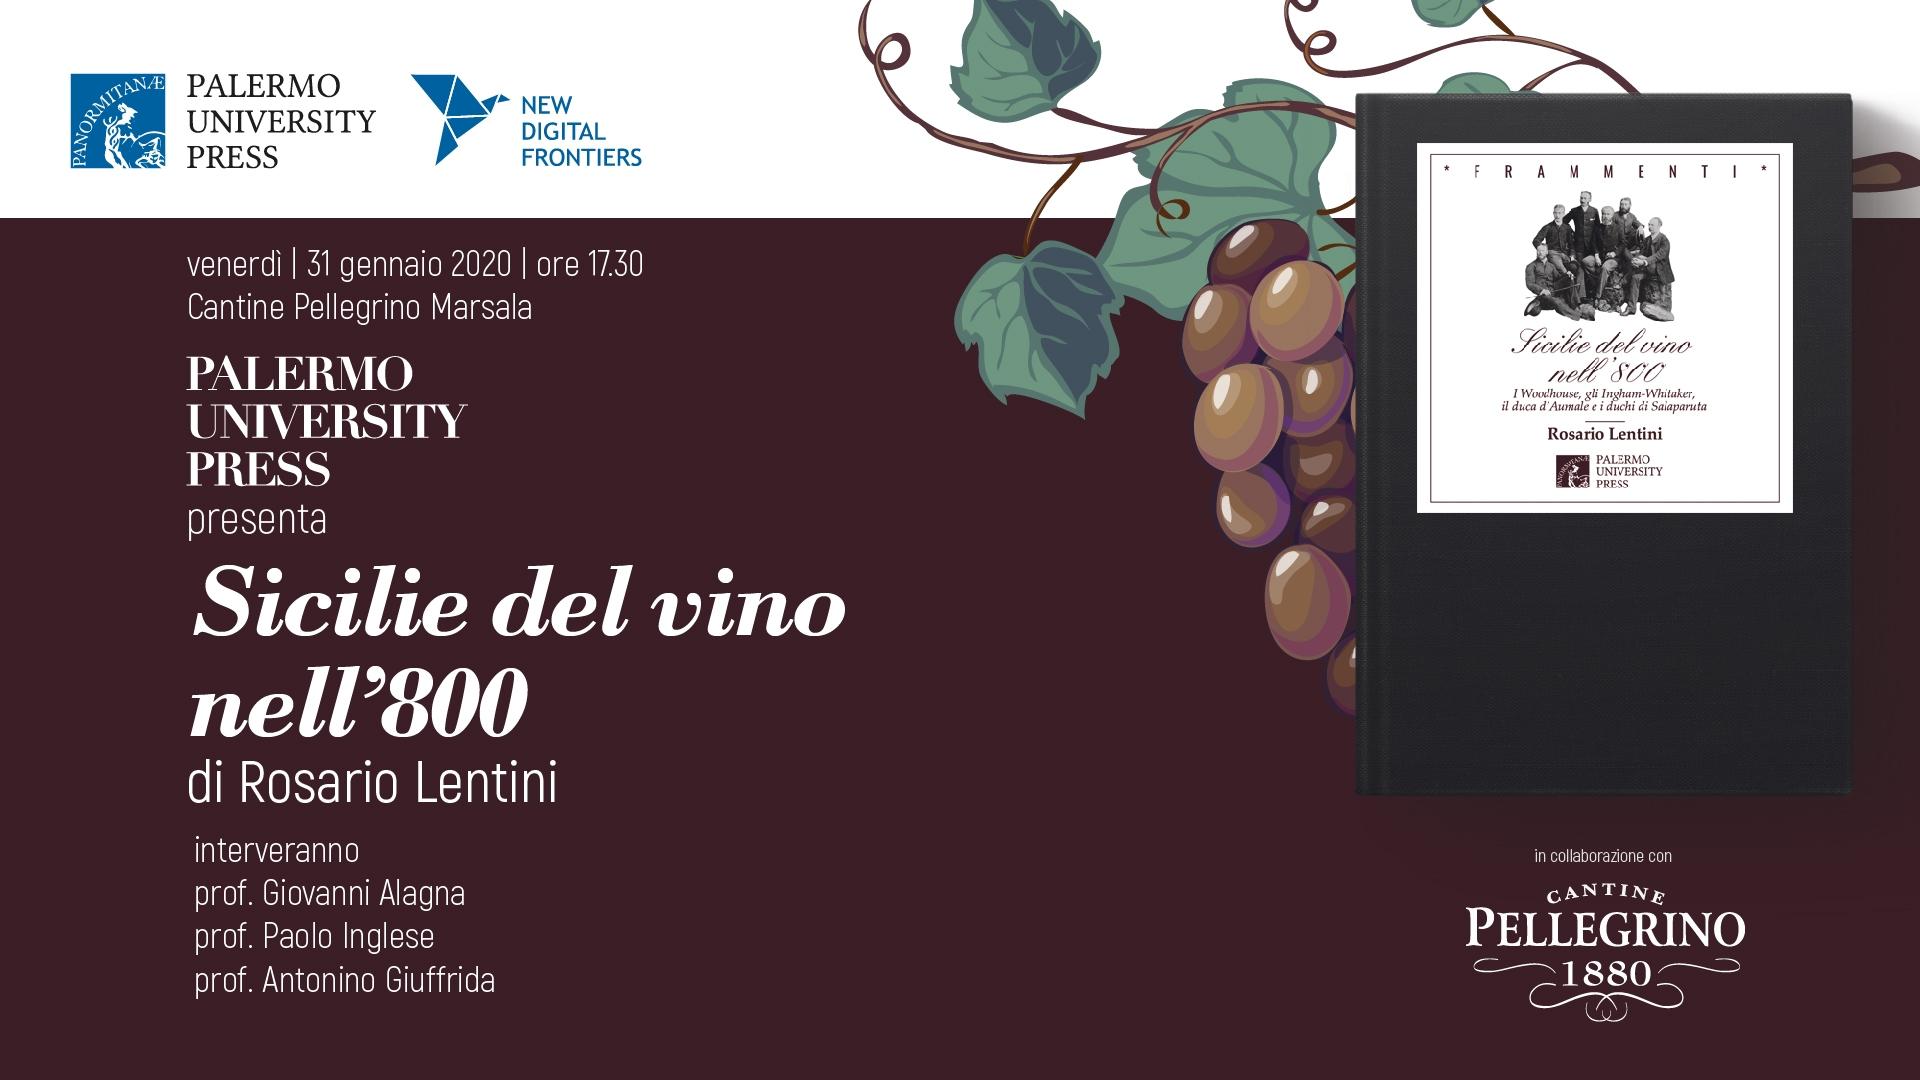 Sicilie del vino - Rosario Lentini